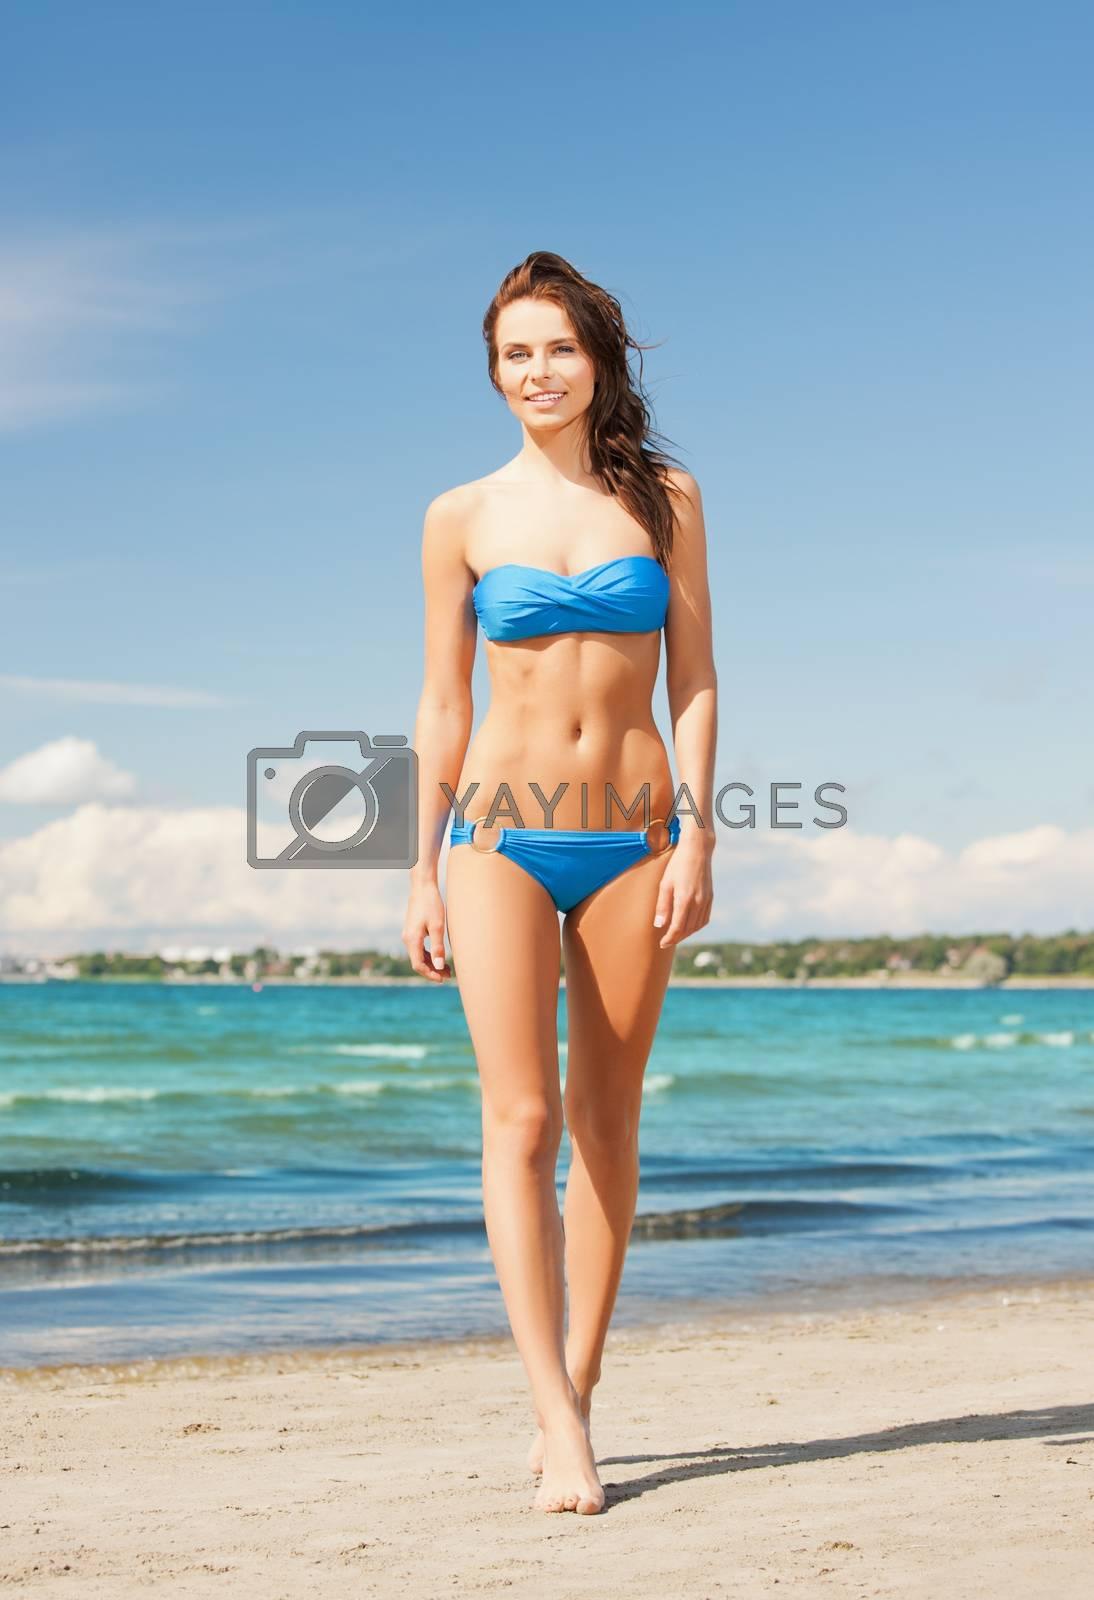 woman in bikini smiling by dolgachov